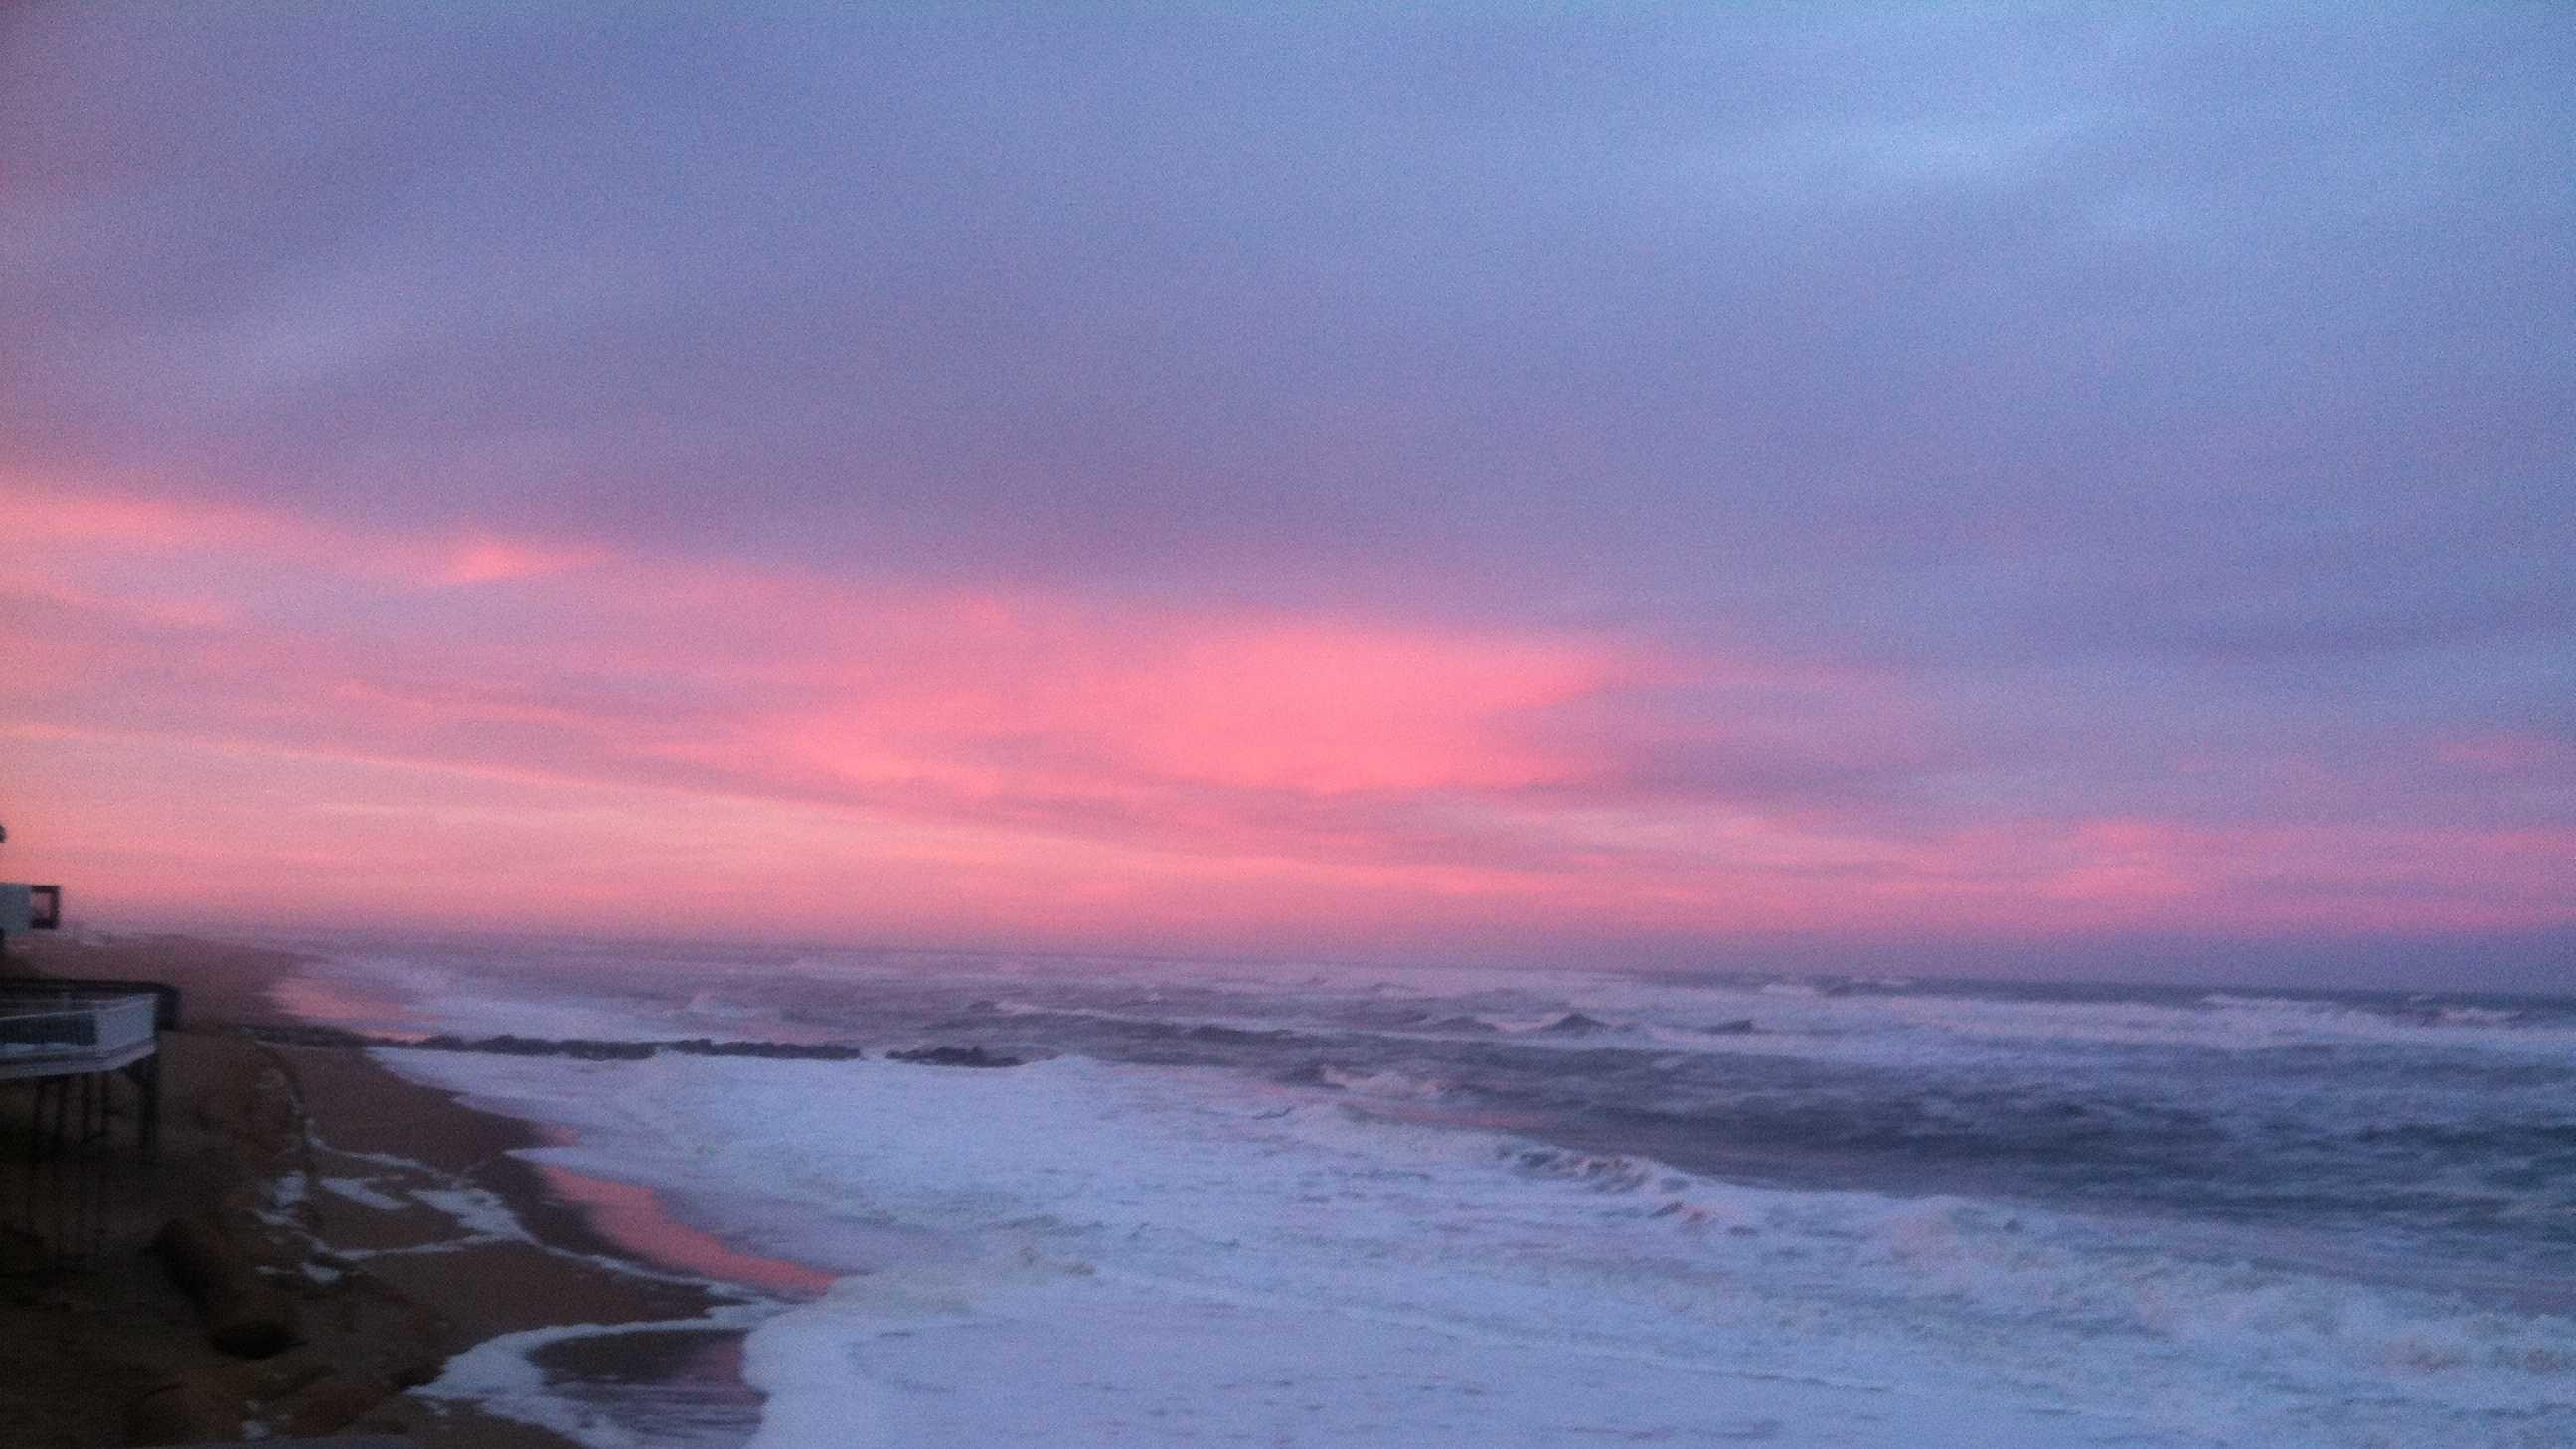 Storm sunset